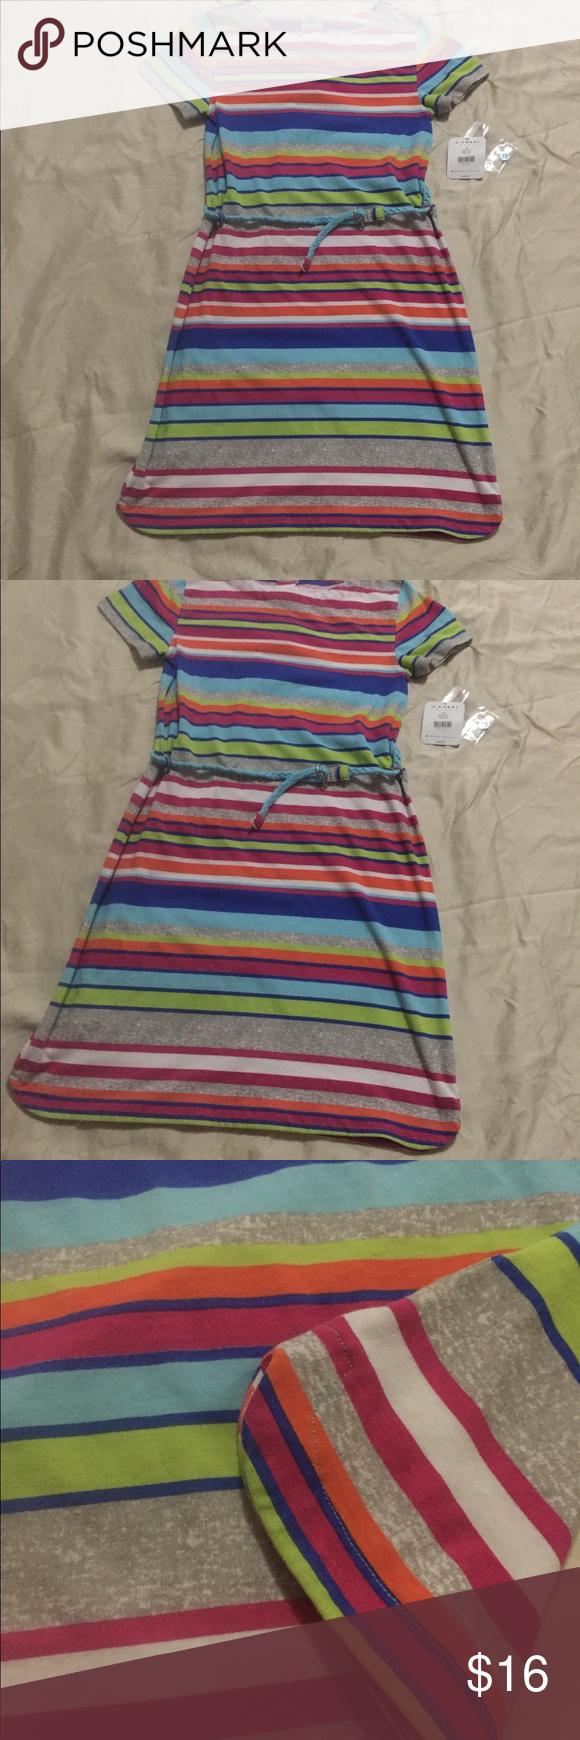 New j khaki dress size m boutique khakis dress casual